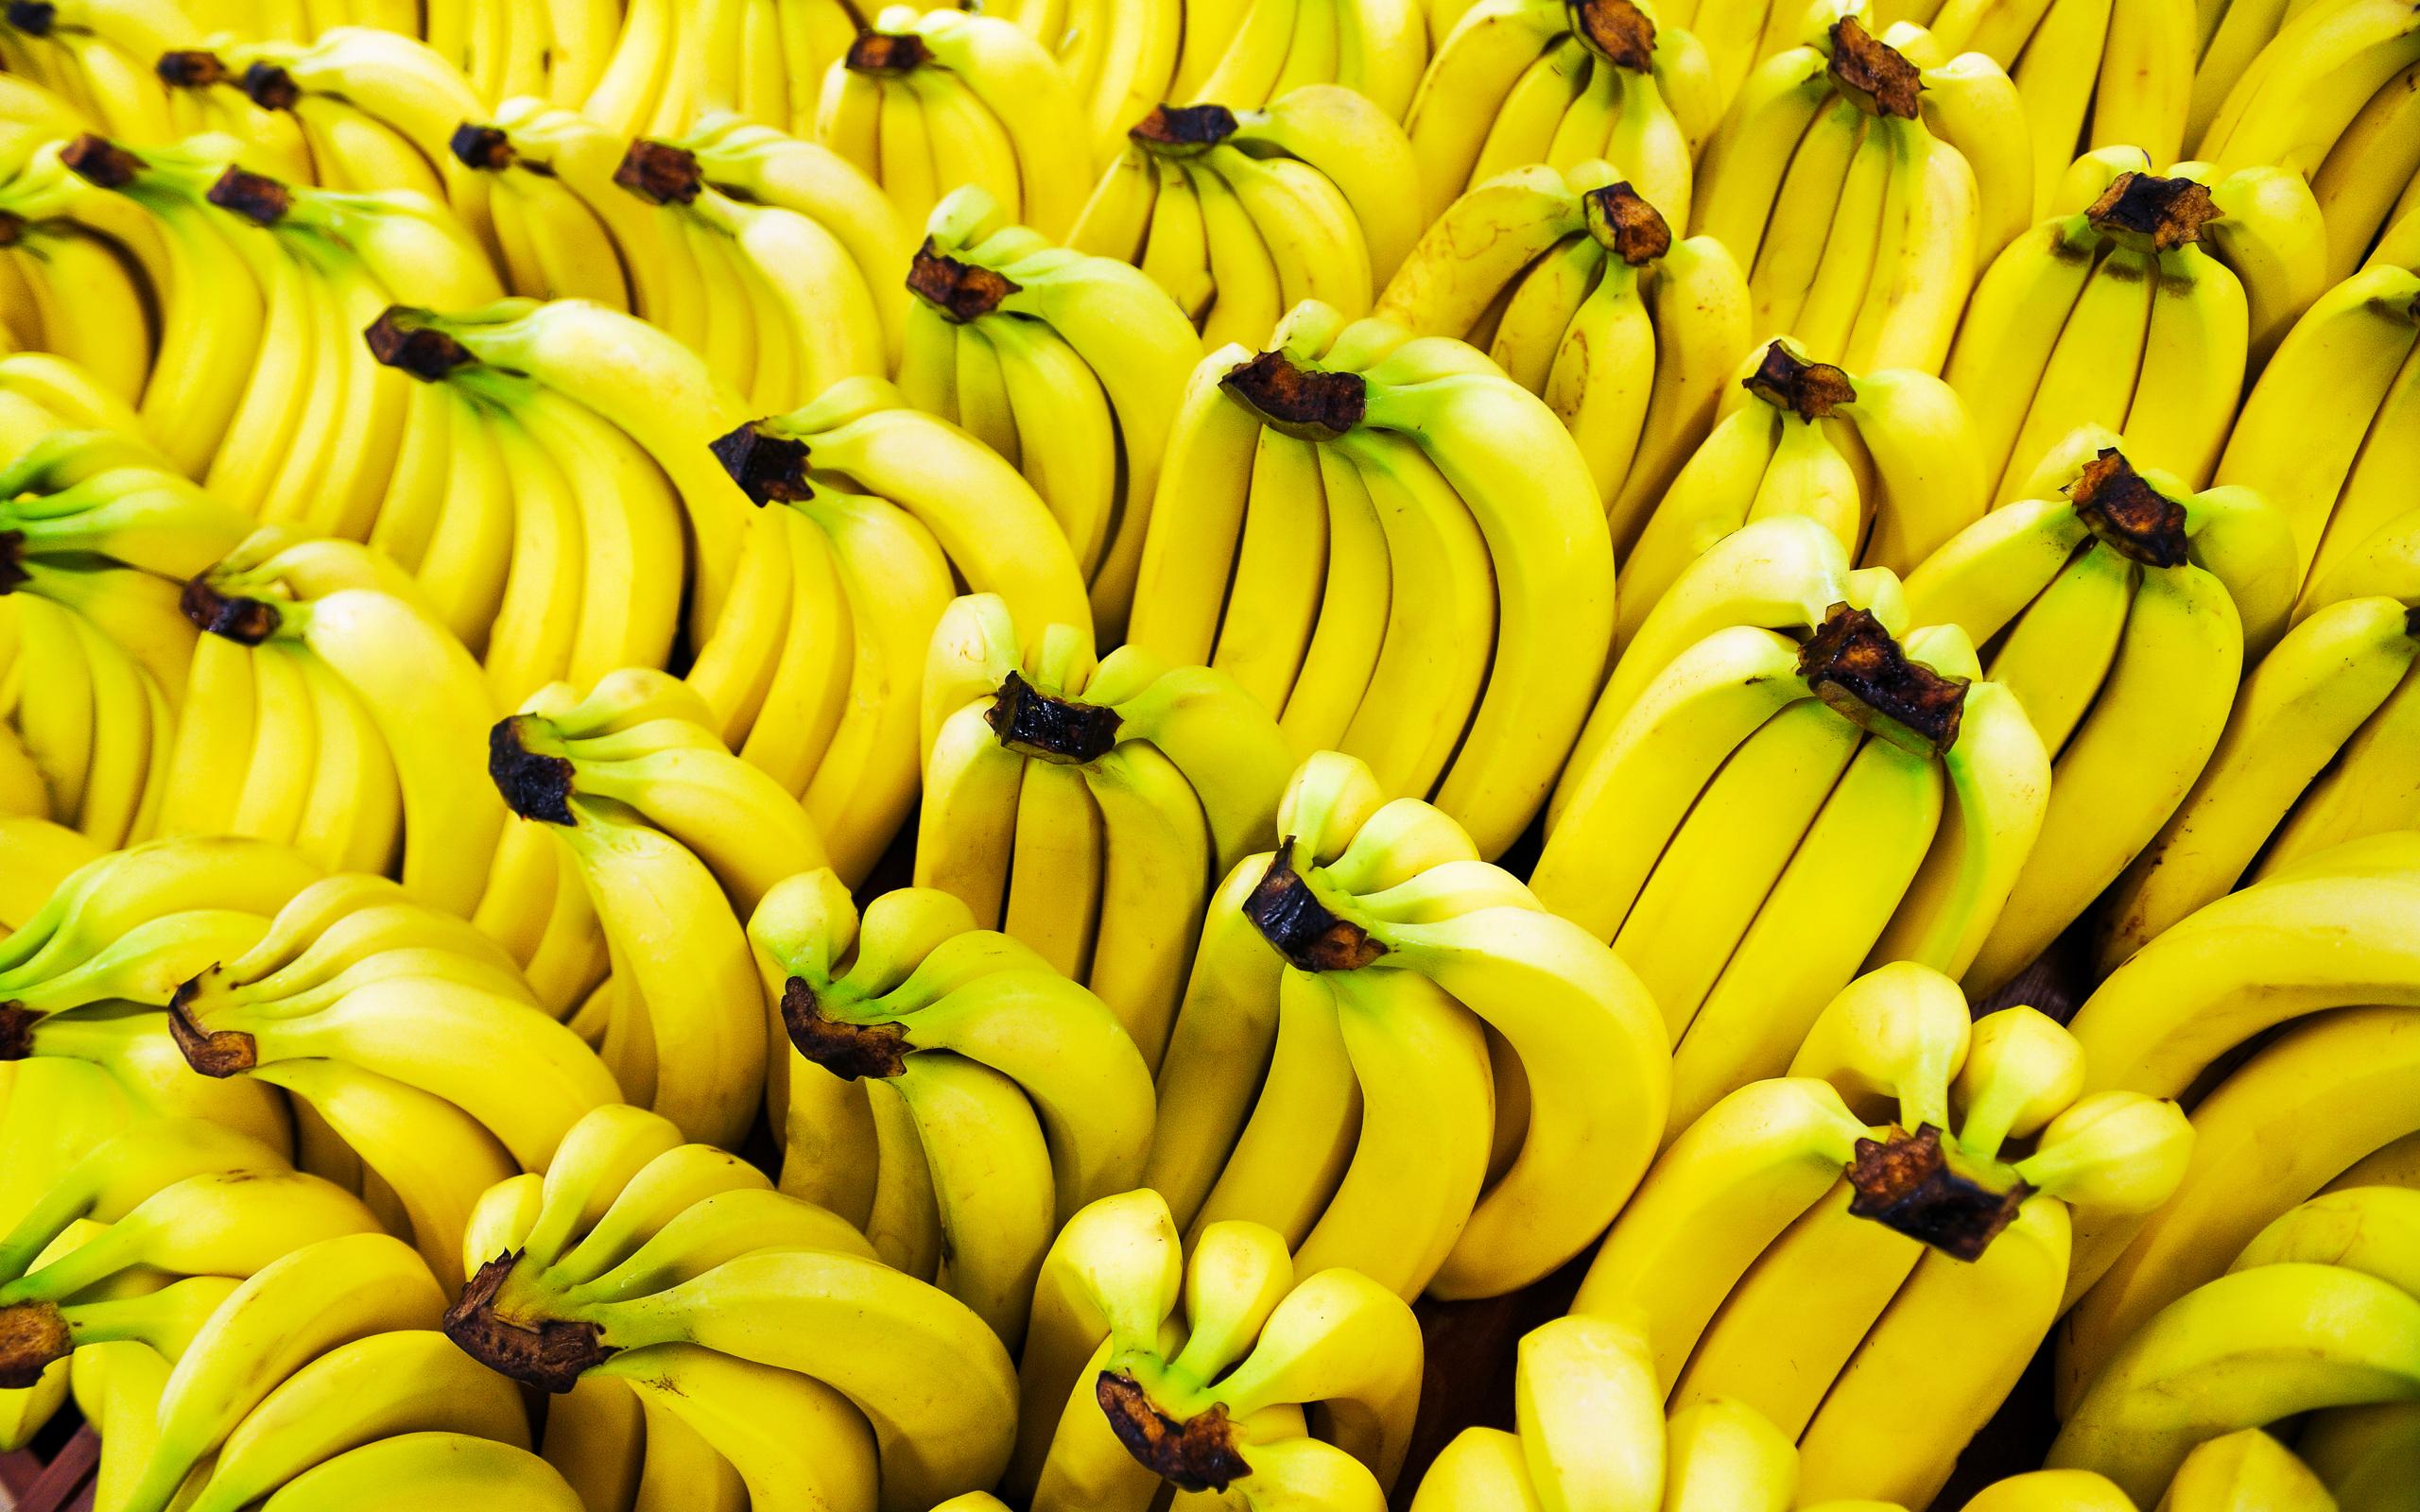 dieta-na-bananah-otzyvy